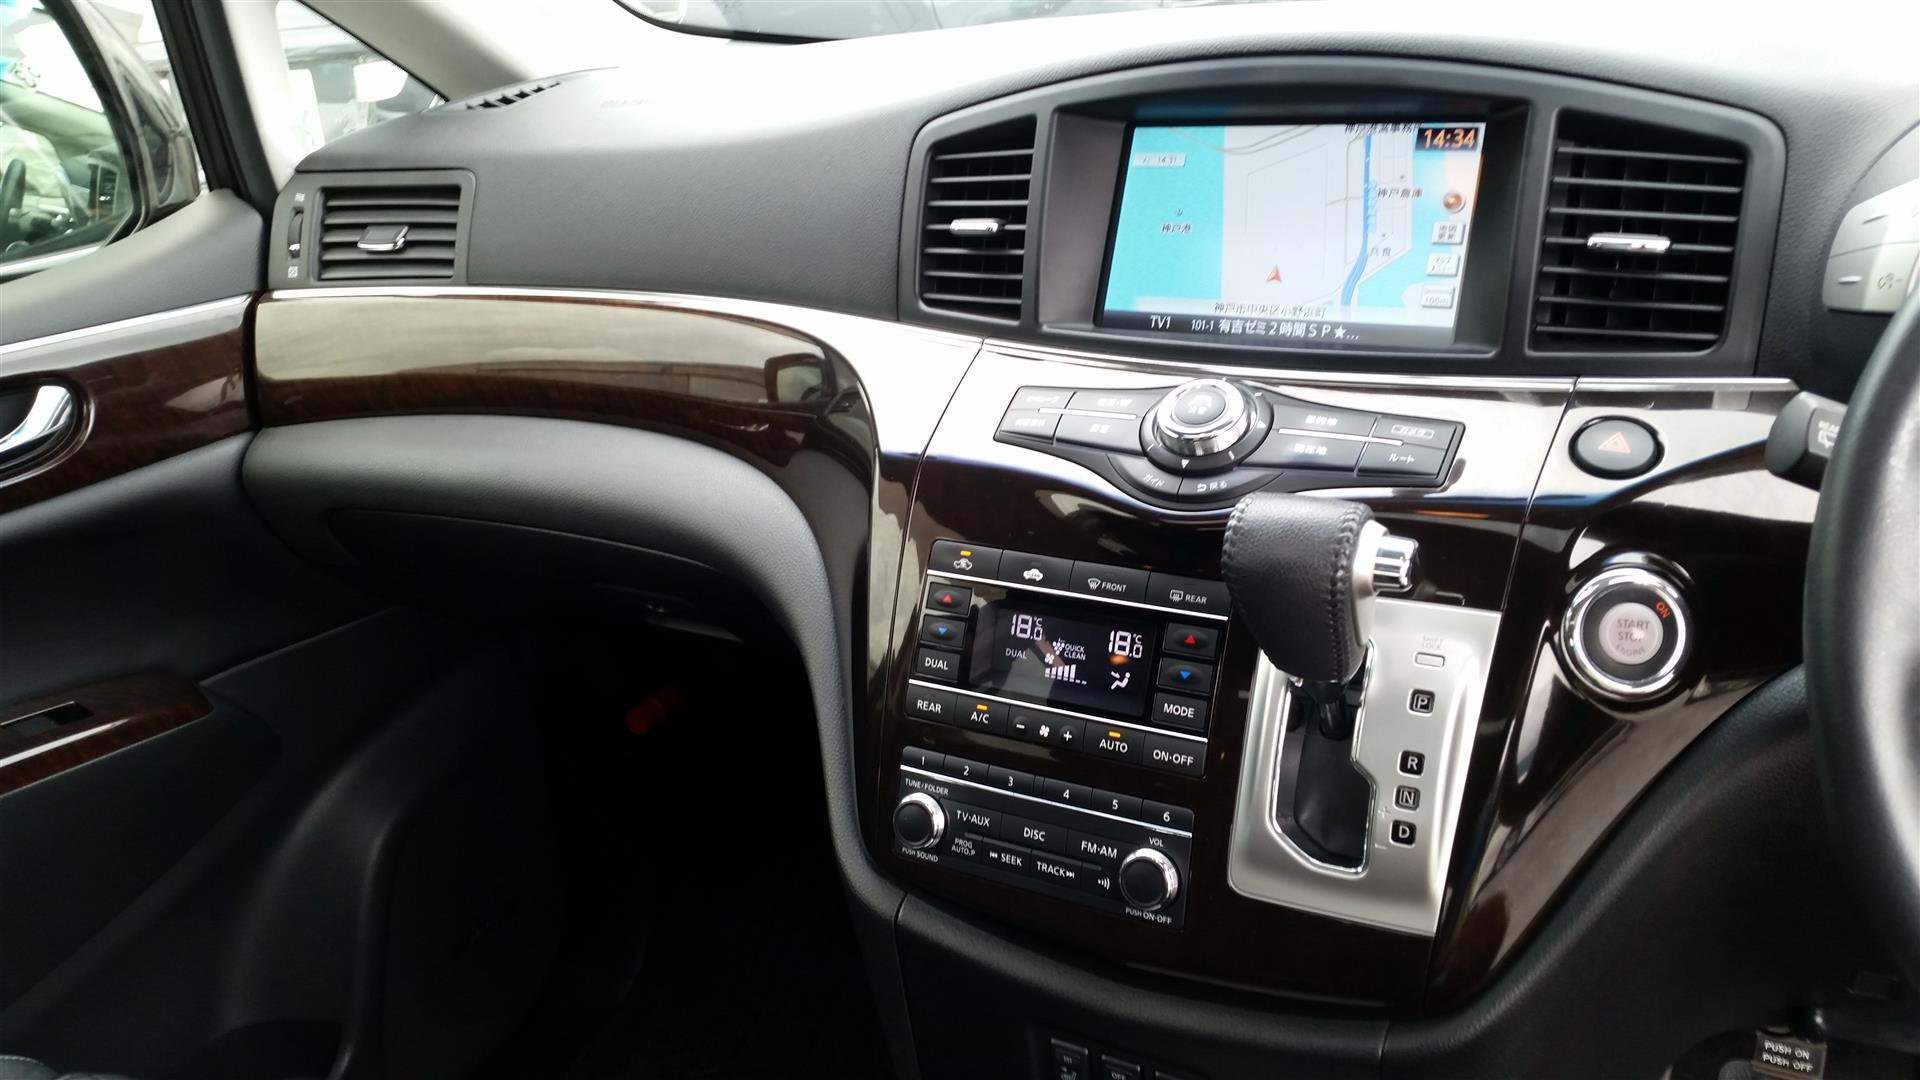 2012 Nissan Elgrand E52 20150627_143454 (Large)